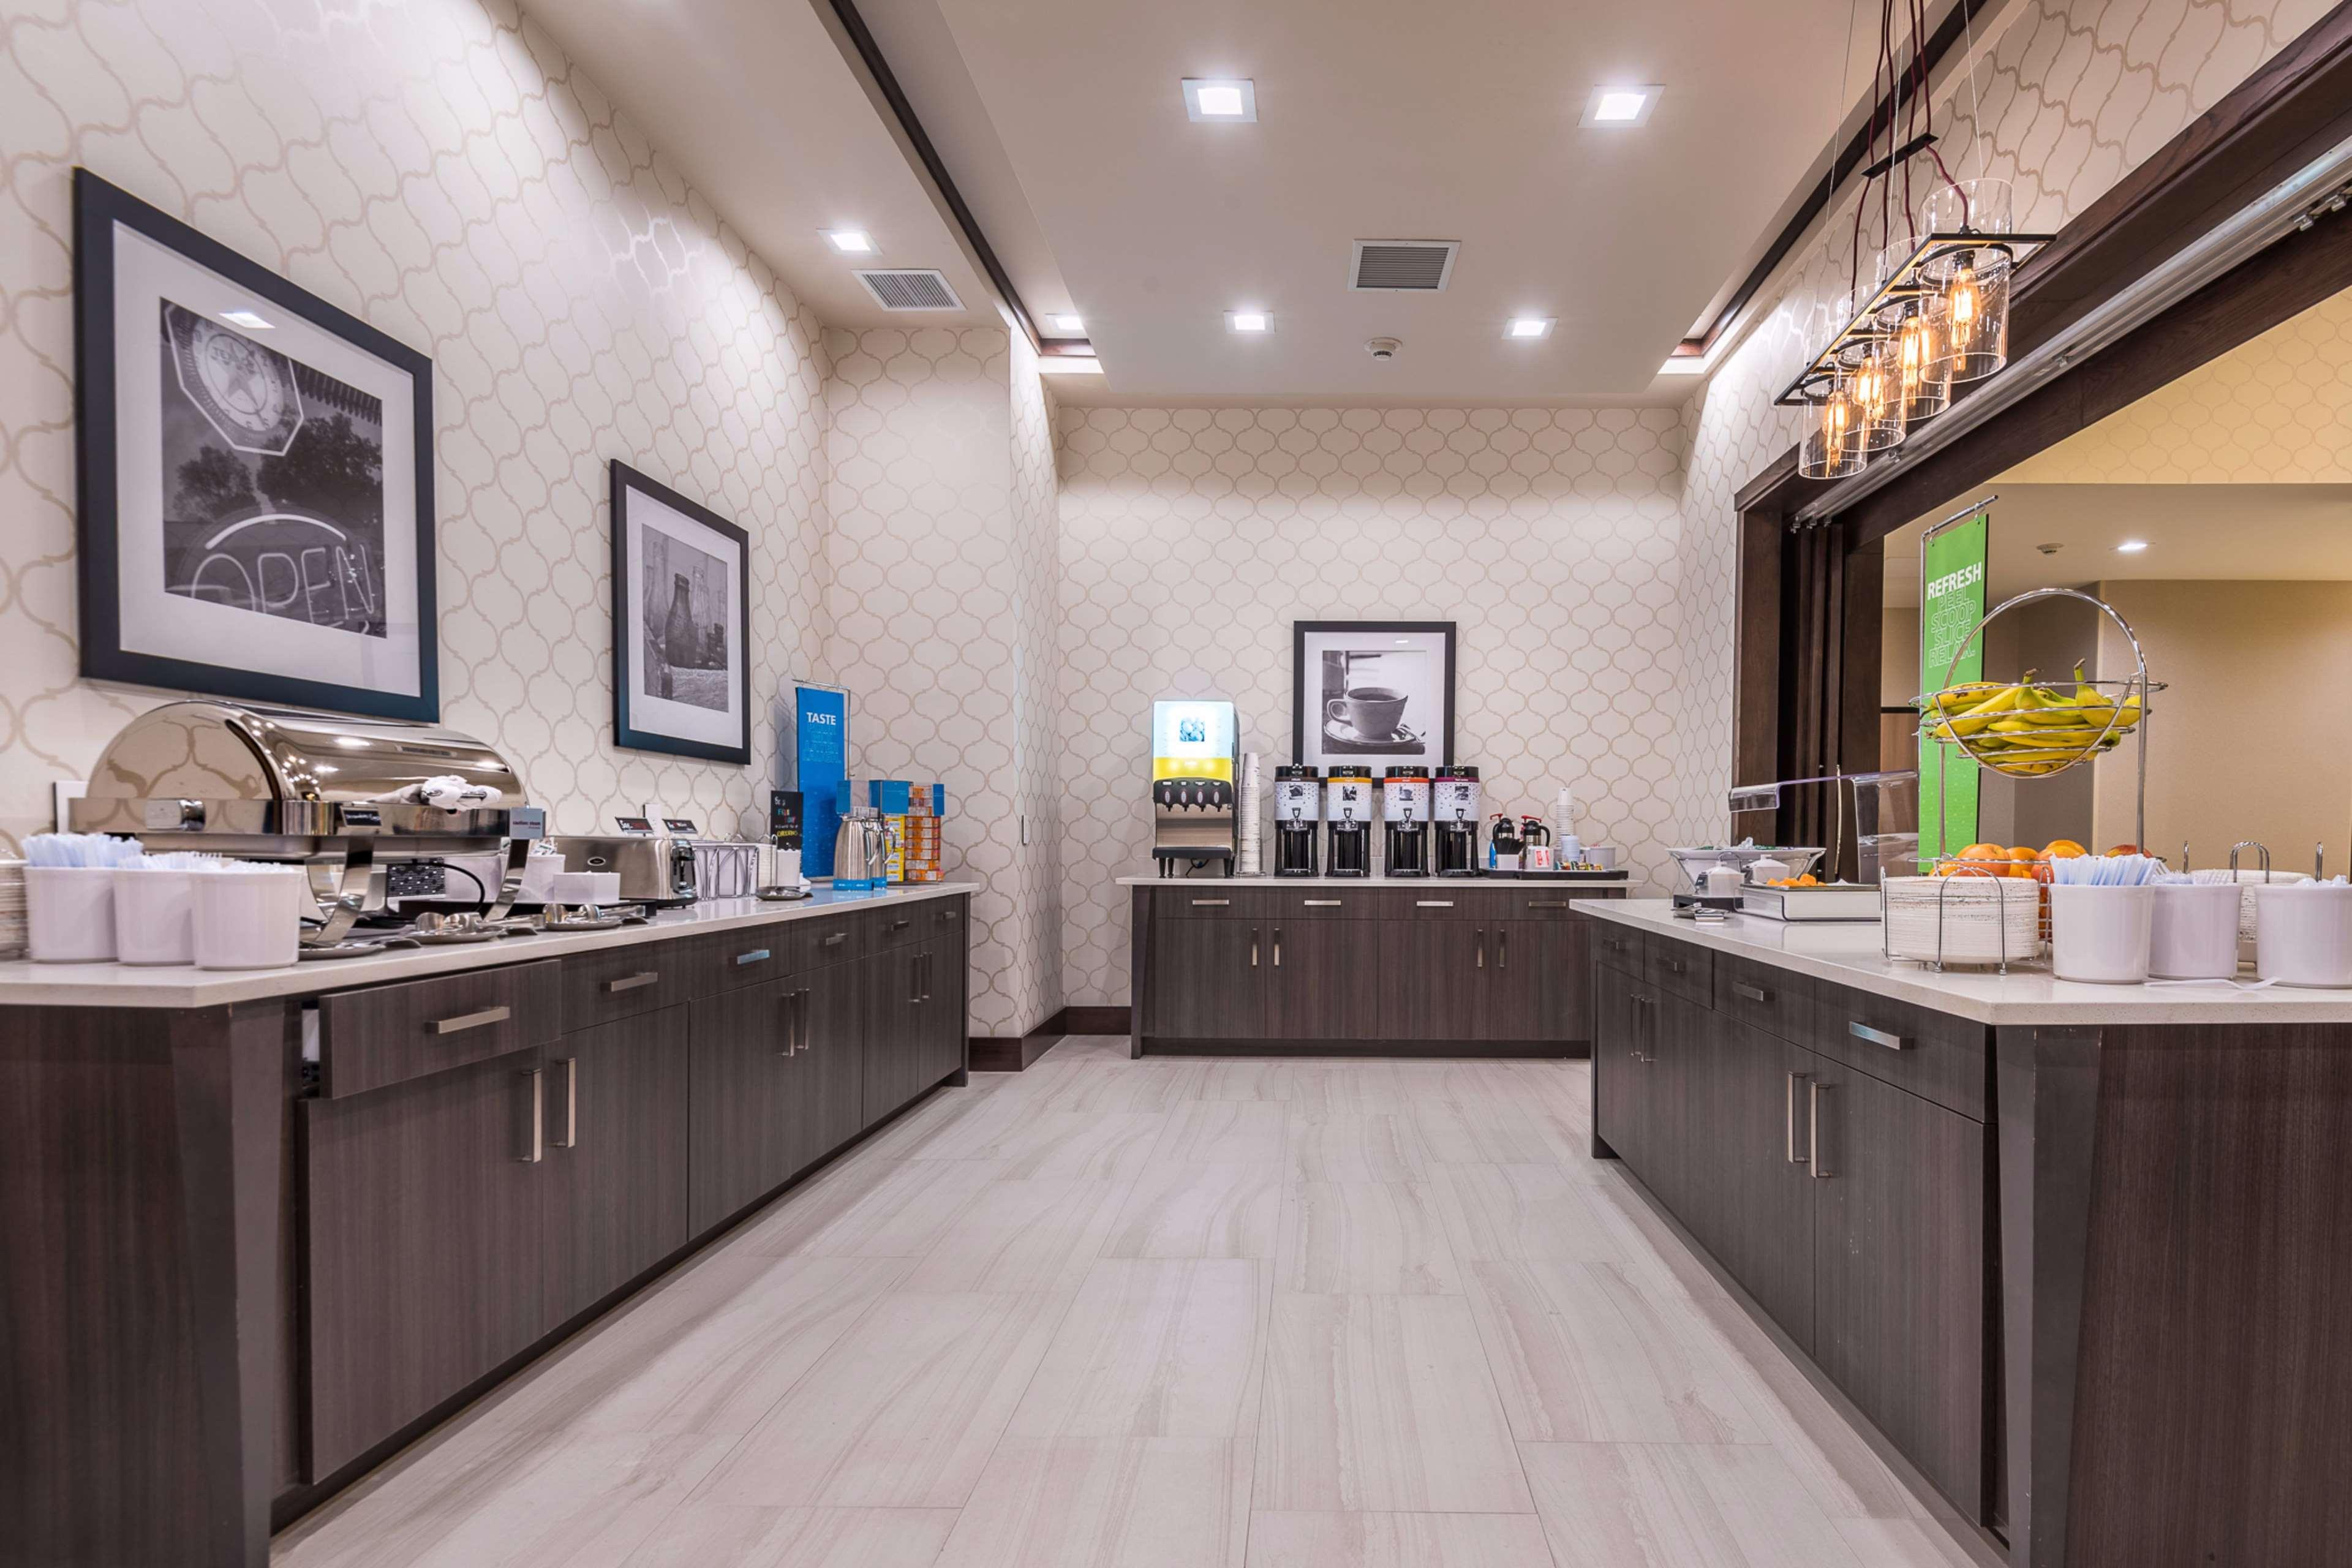 Hampton Inn & Suites Dallas-The Colony, TX image 10